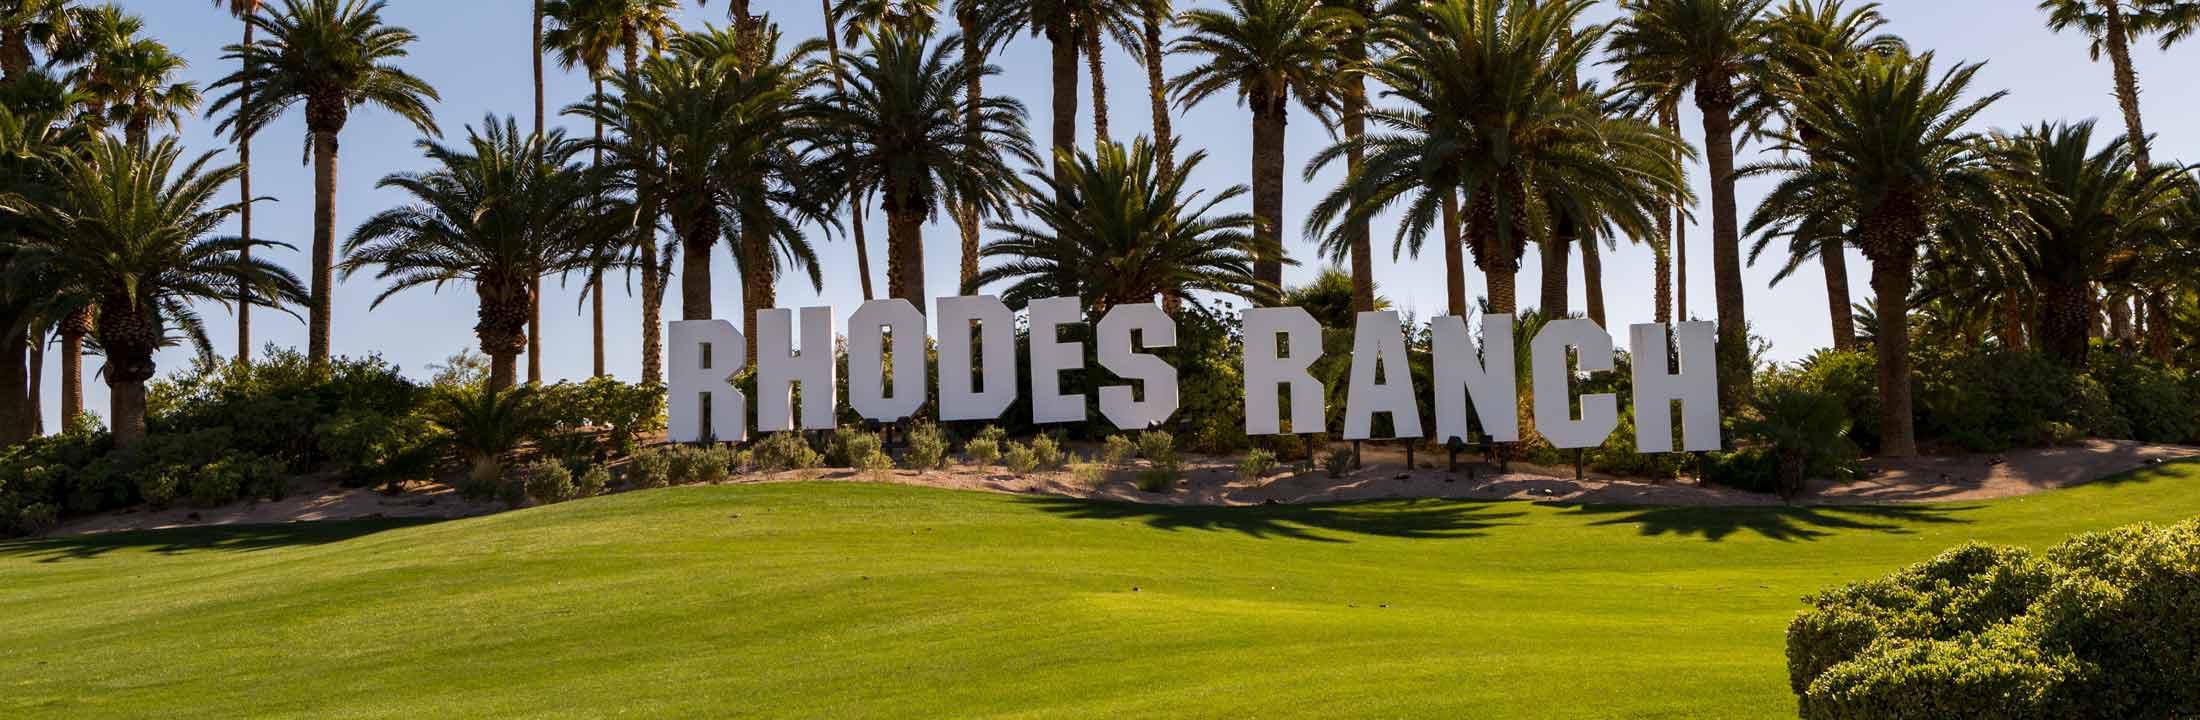 rhodes-ranch-homes-for-sale-las-vegas